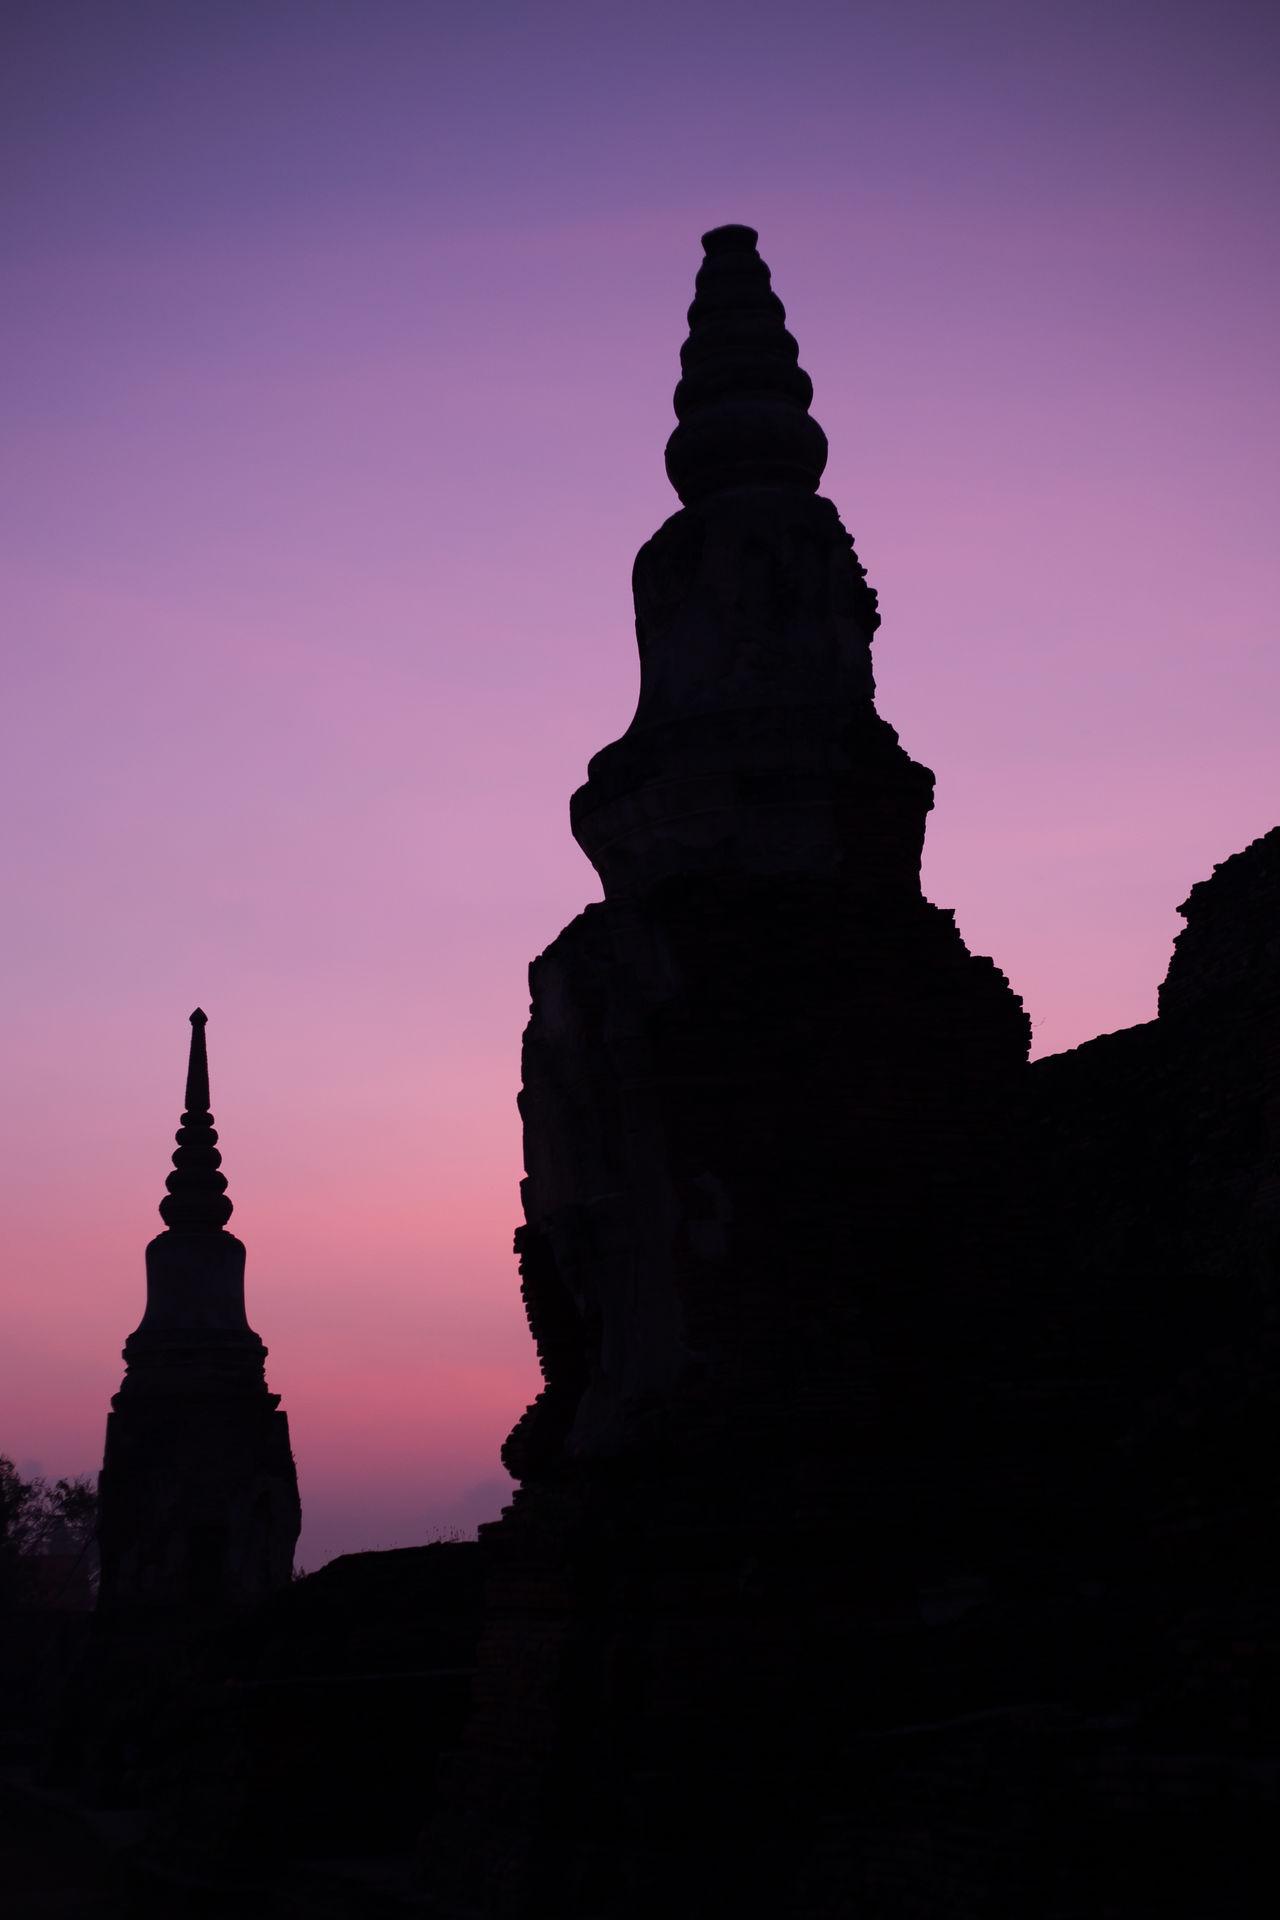 Sunrise in Ayutthaya, Thailand Animals Ayutthaya Ayutthaya | Thailand Pink Place Of Worship Purple Purple Sky Religion Silhouette Sunrise Temple Thailand Travel Unesco UNESCO World Heritage Site Wat